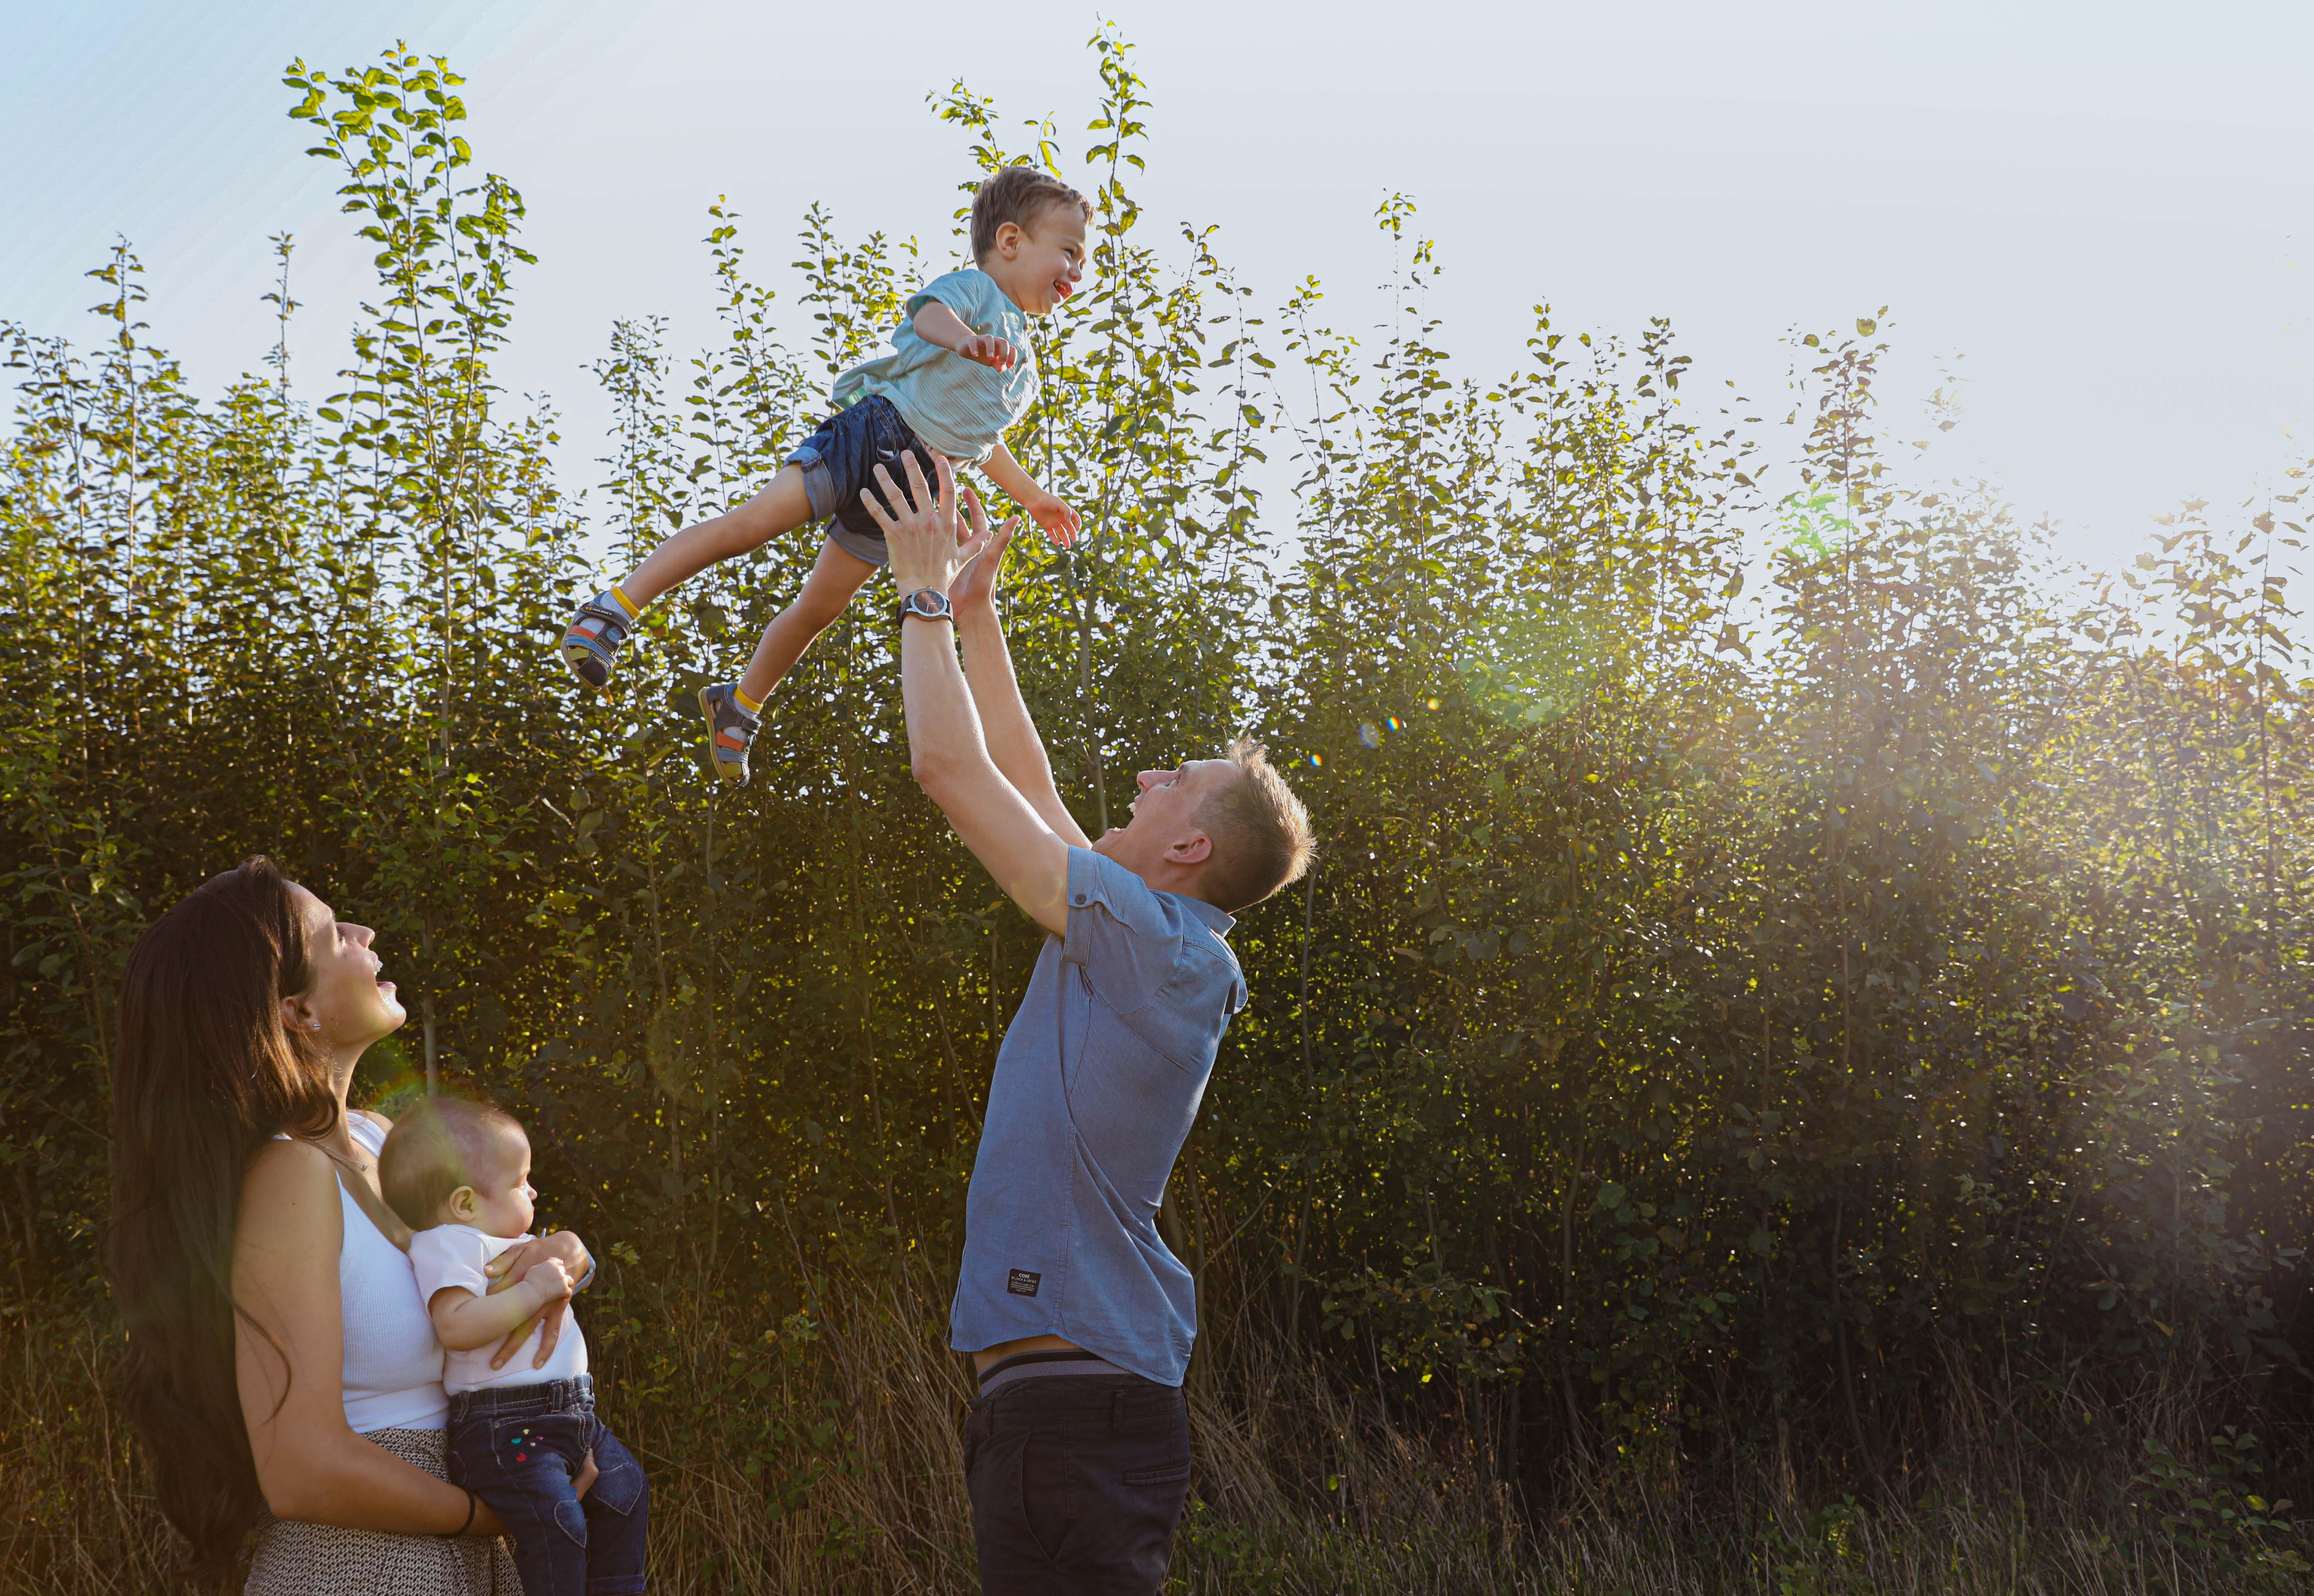 claudialeclercq-familyphotography-photographiedefamille-fotografiafamilia-10